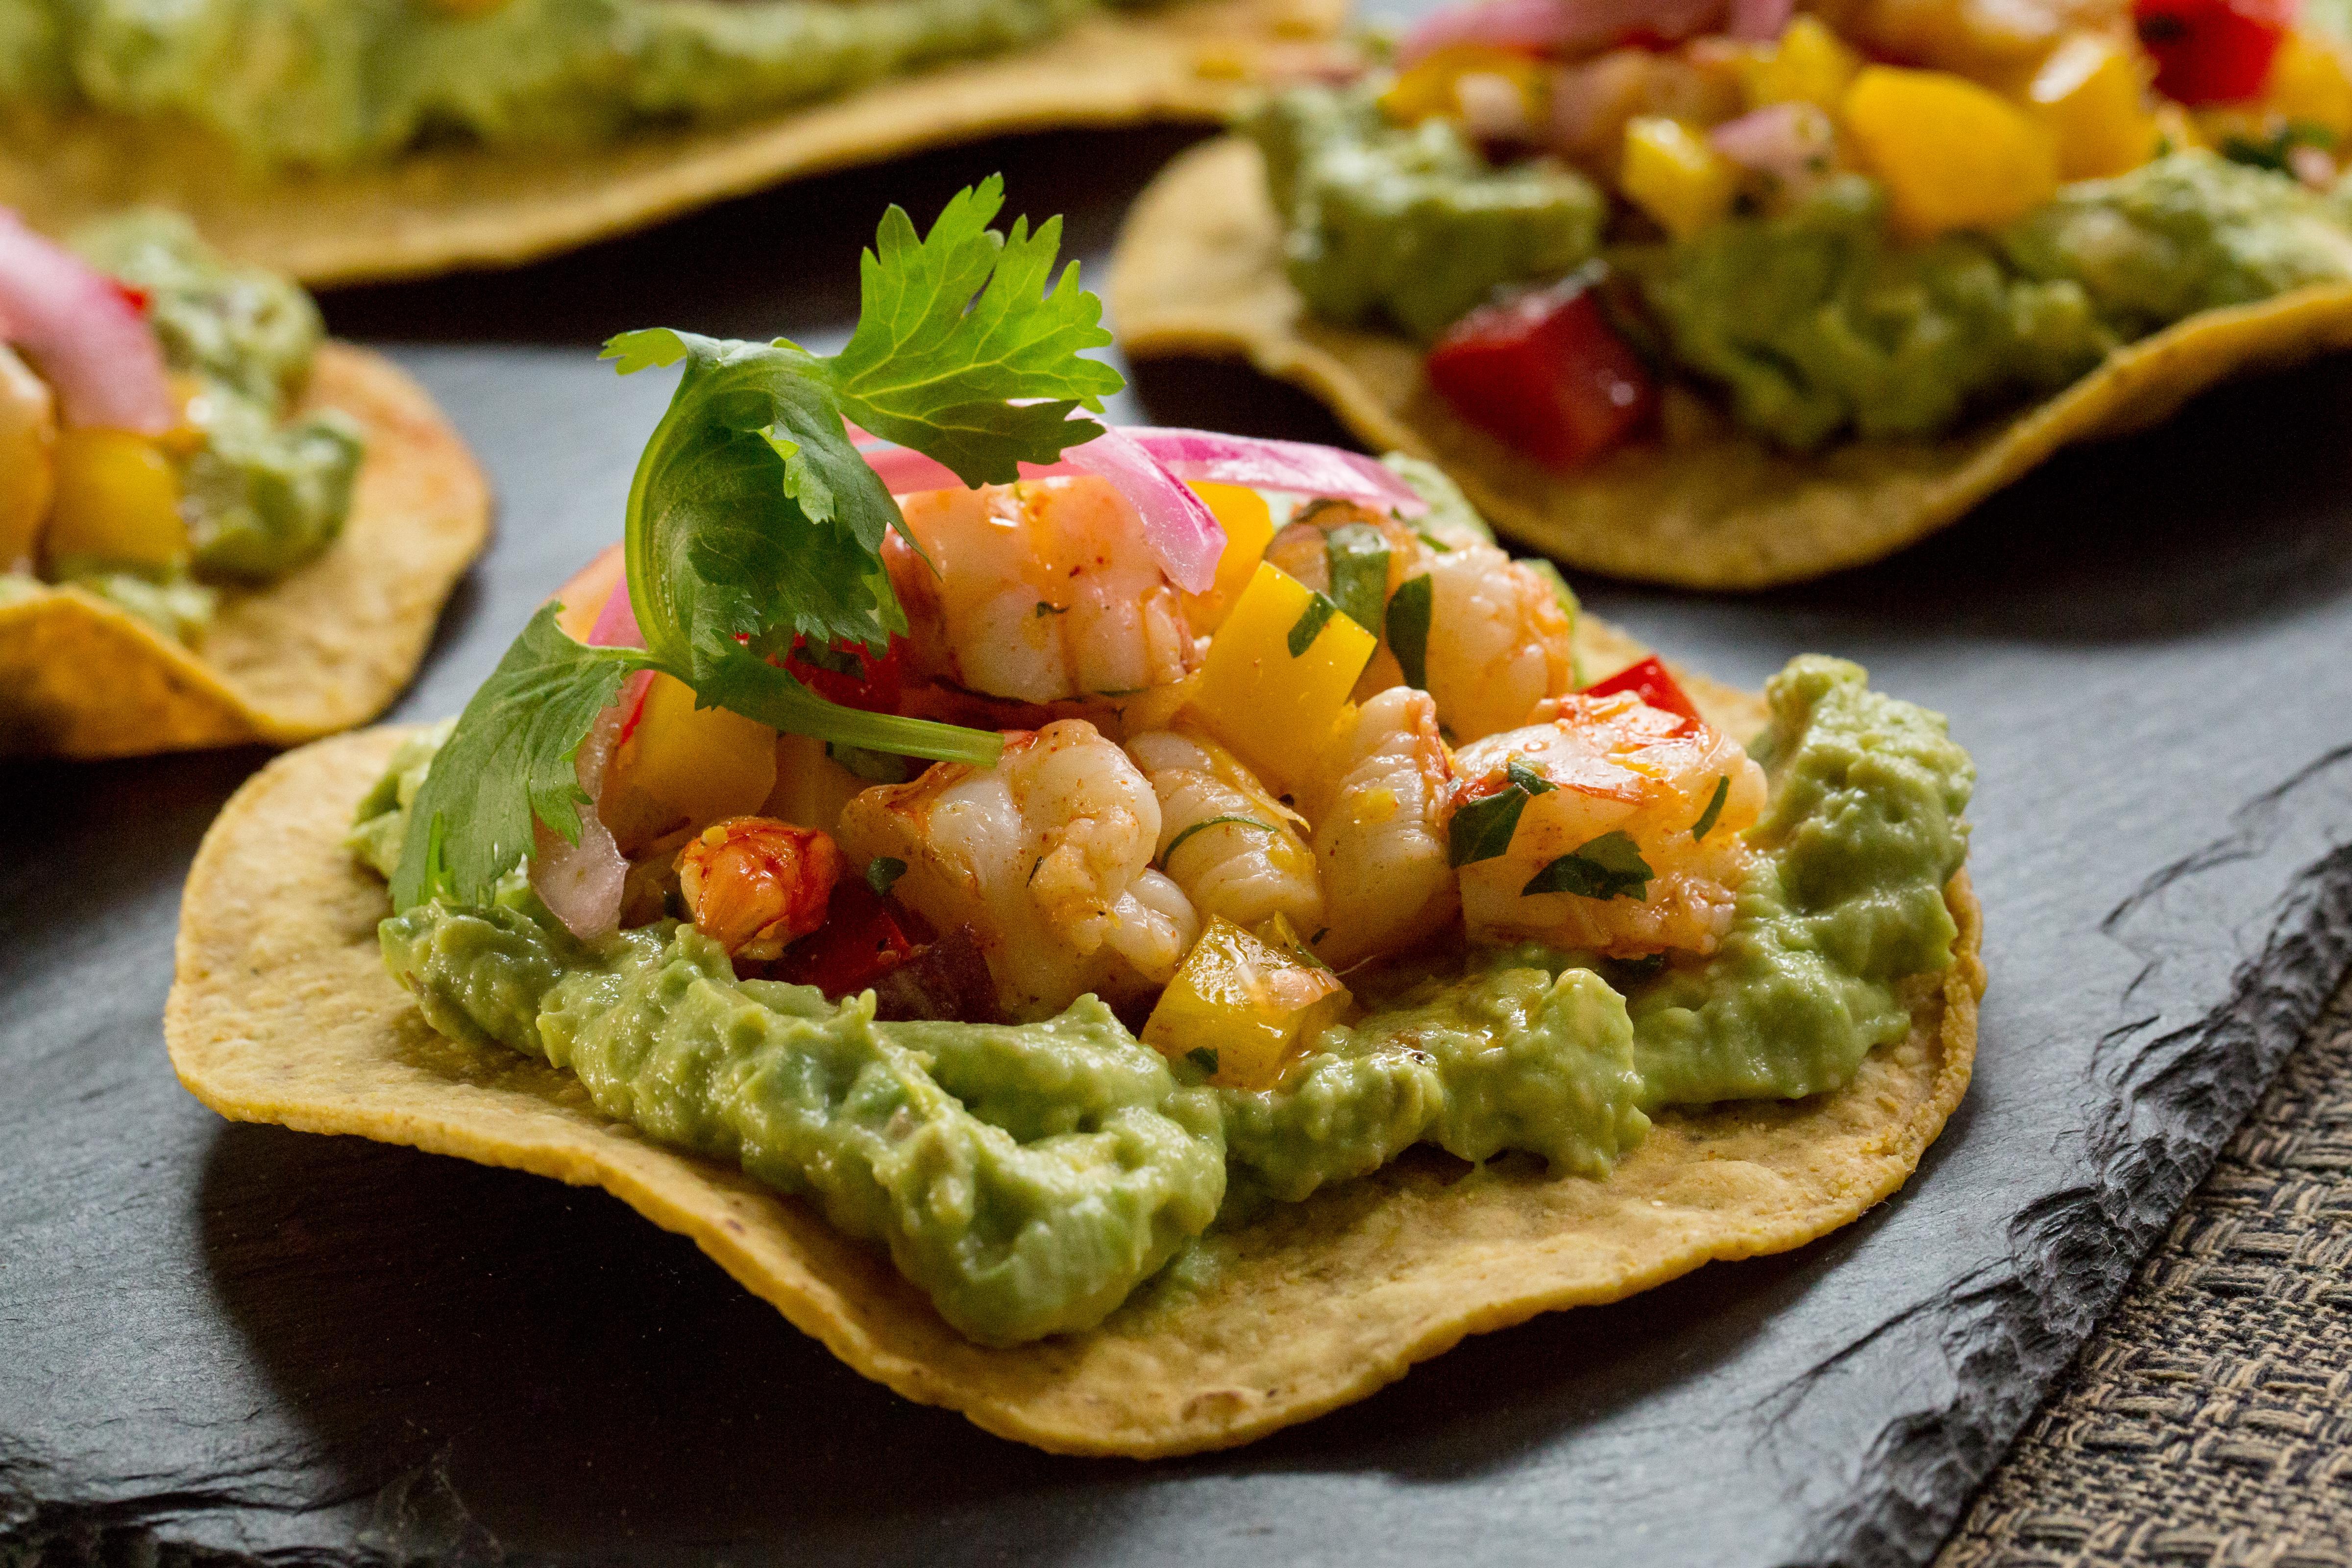 Shrimp tostadas are an easy-to-make crowd-pleaser